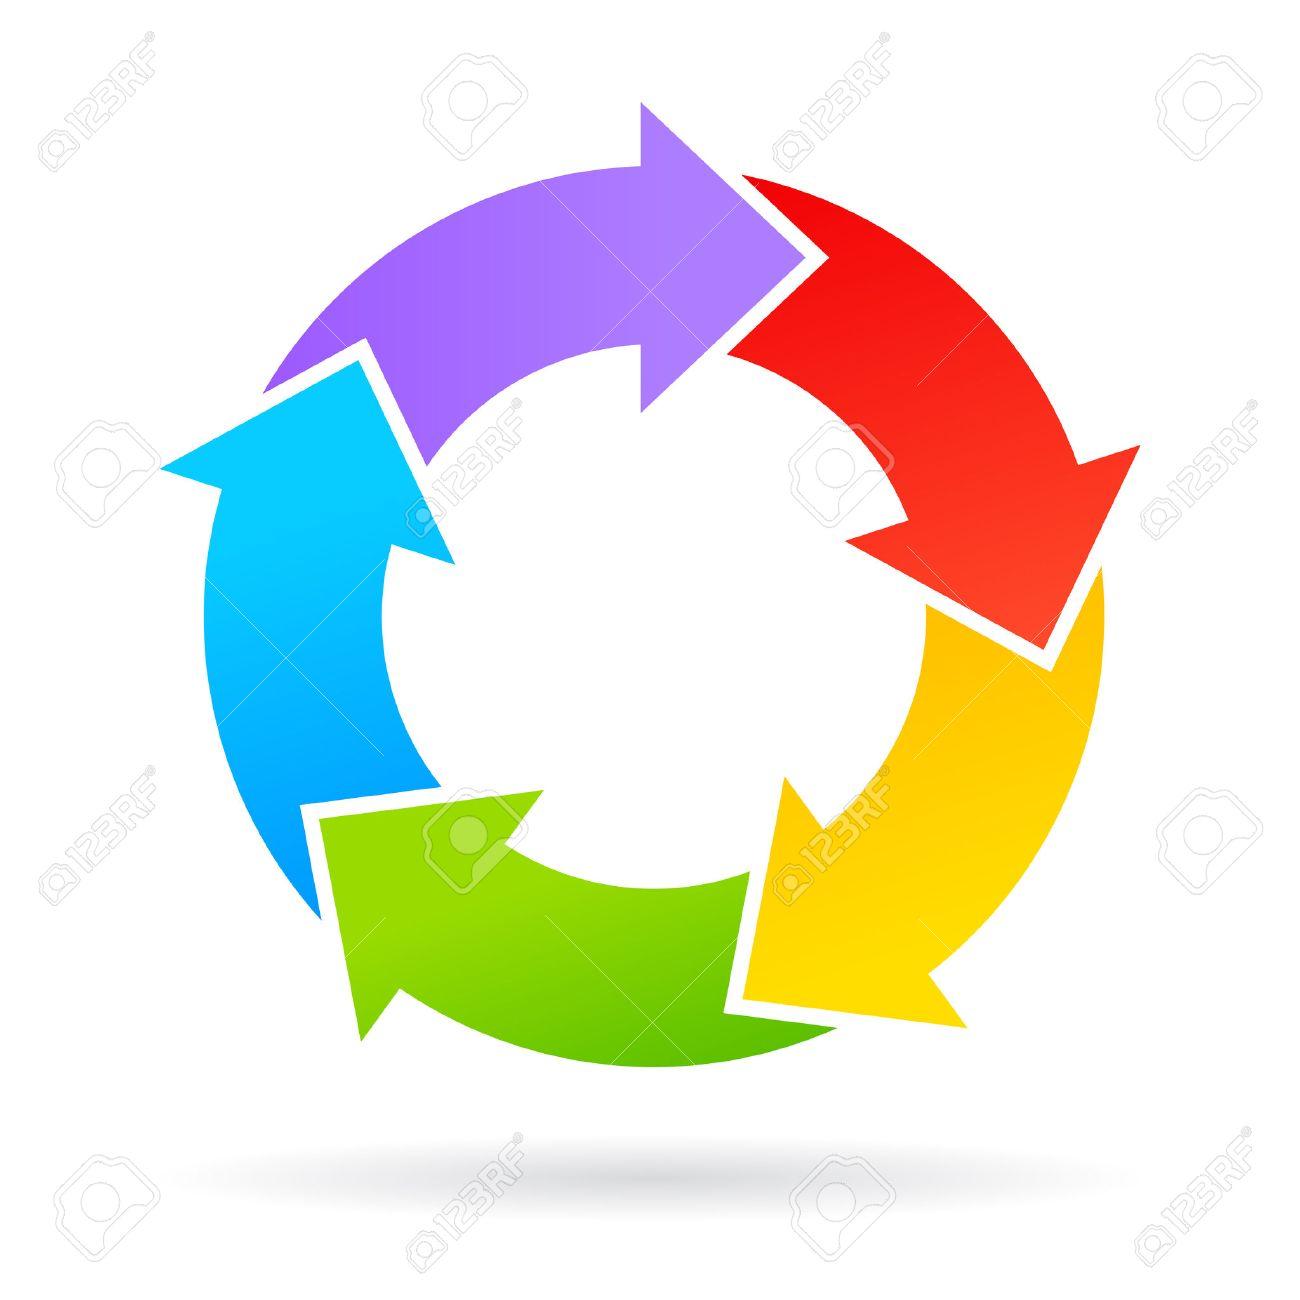 5 arrows chart wheel royalty free cliparts vectors and stock 5 arrows chart wheel stock vector 41919932 ccuart Choice Image